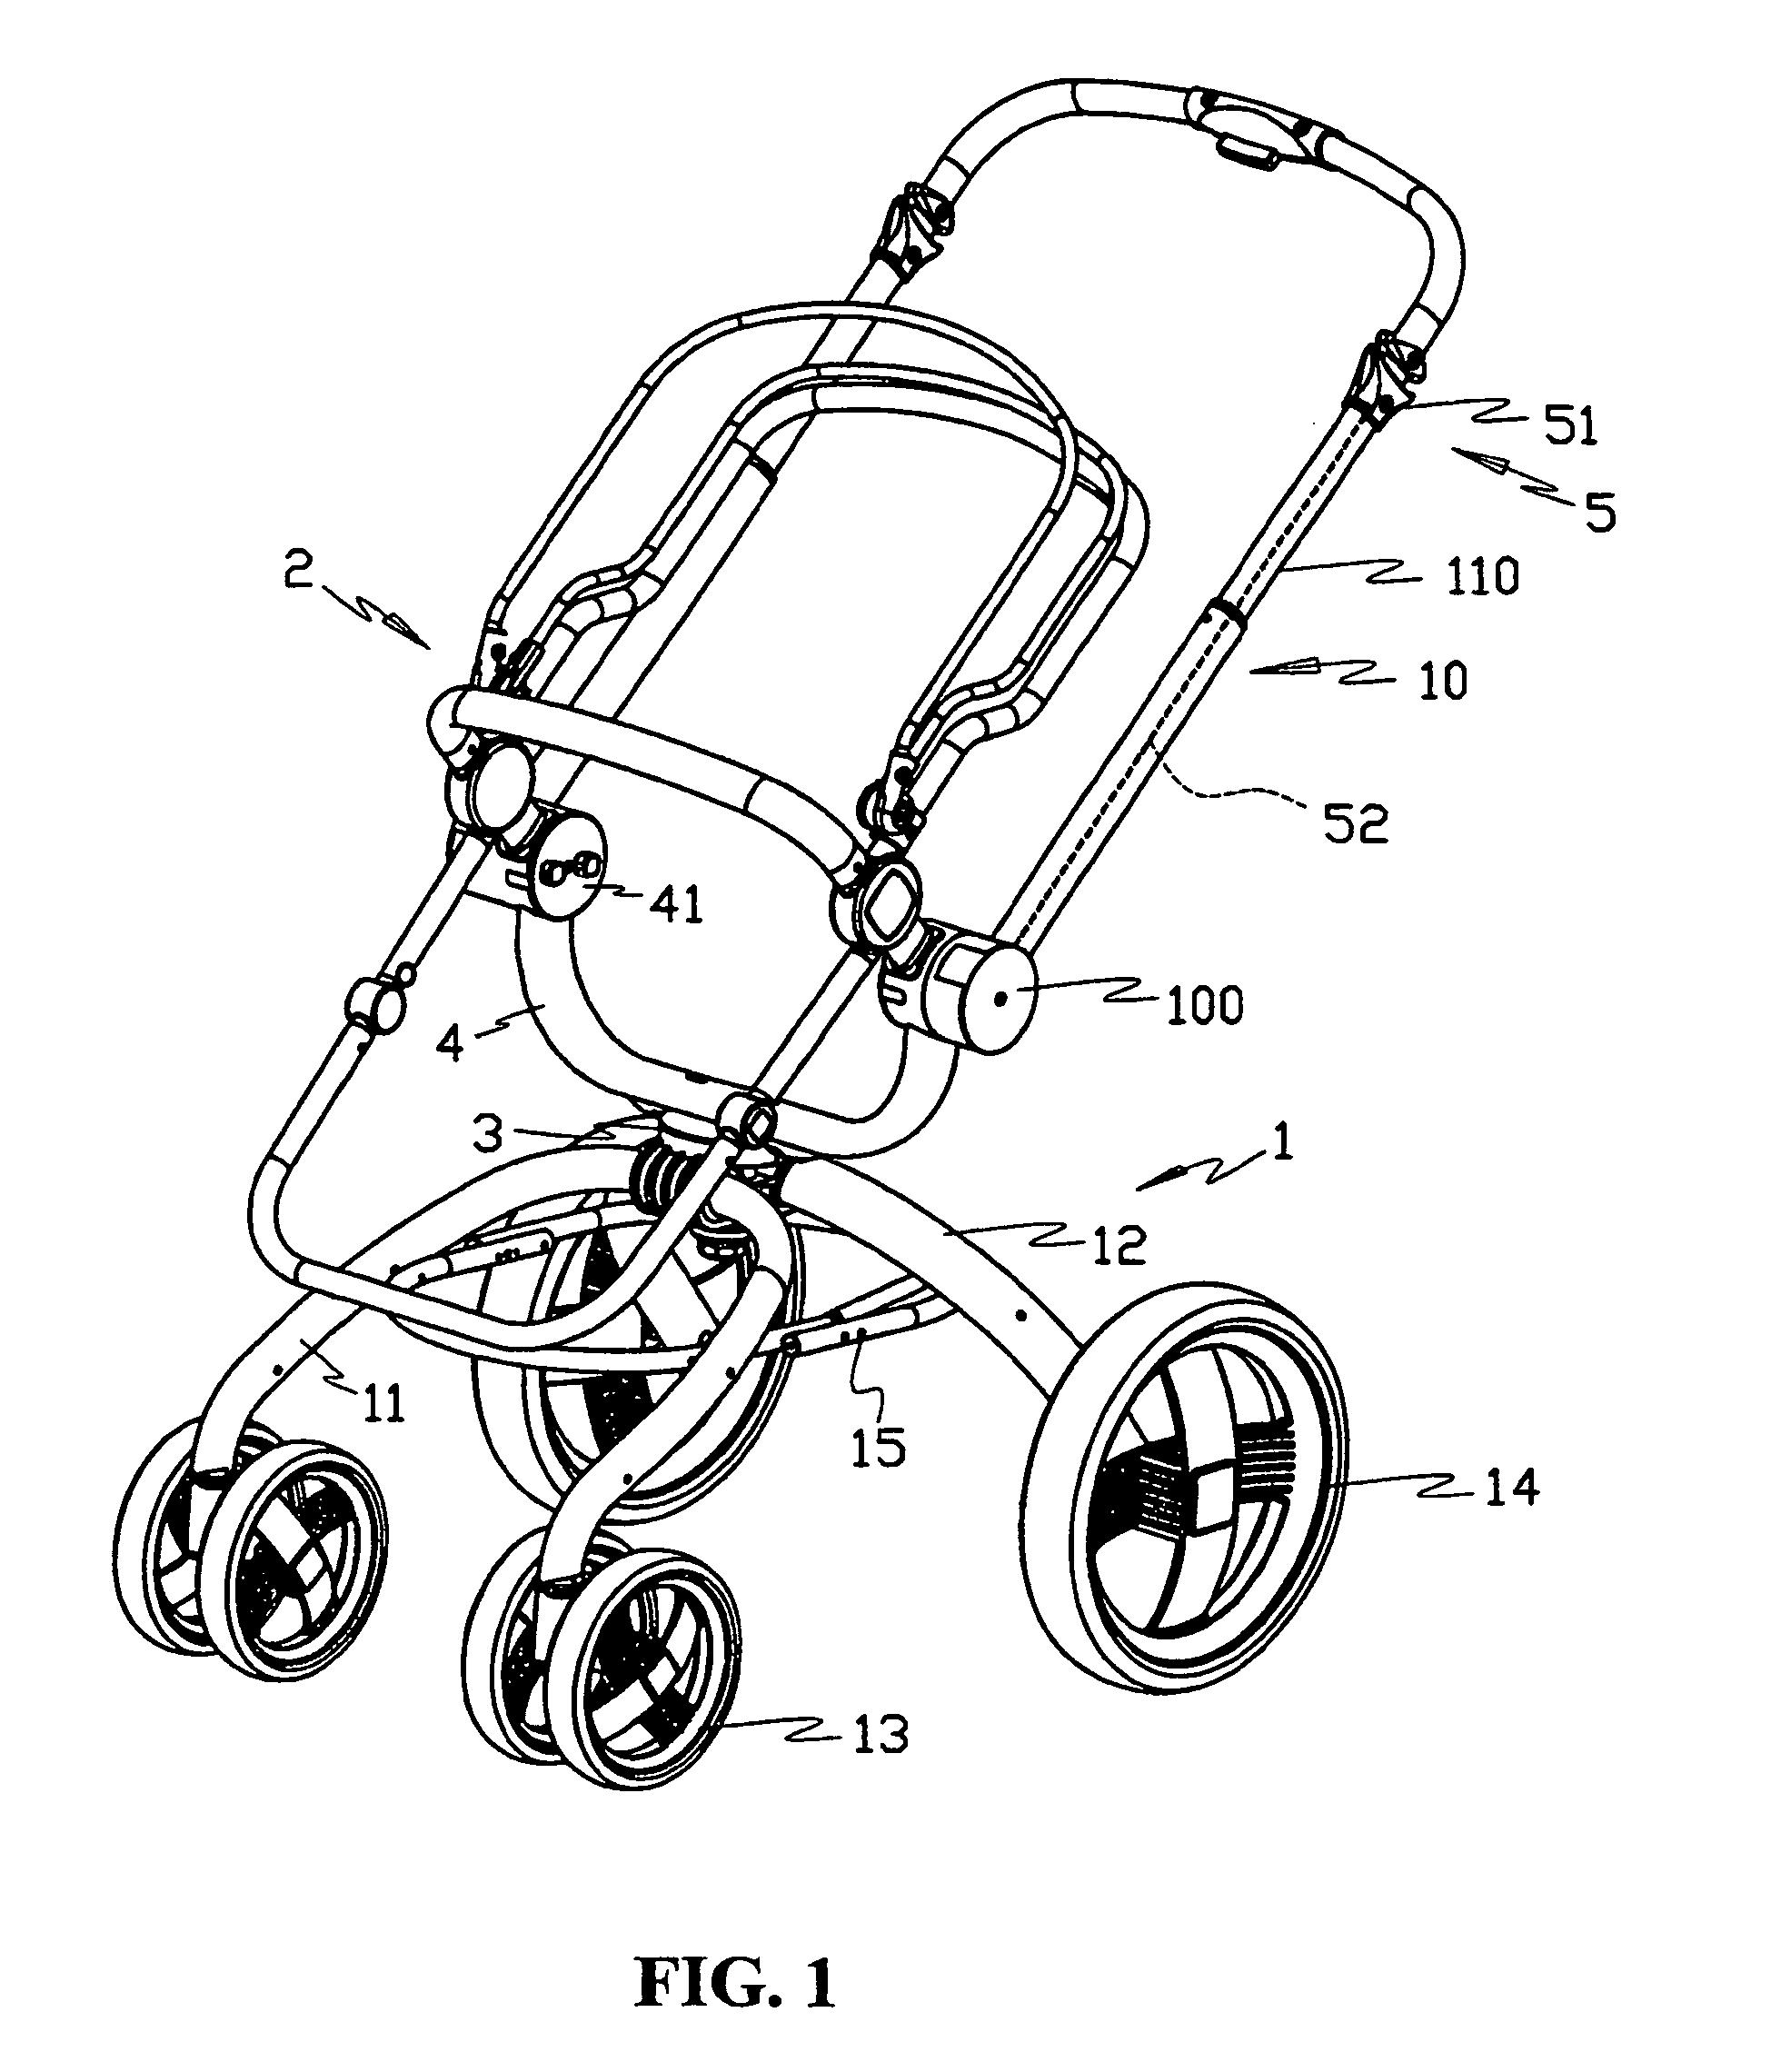 micromax a27 diagram